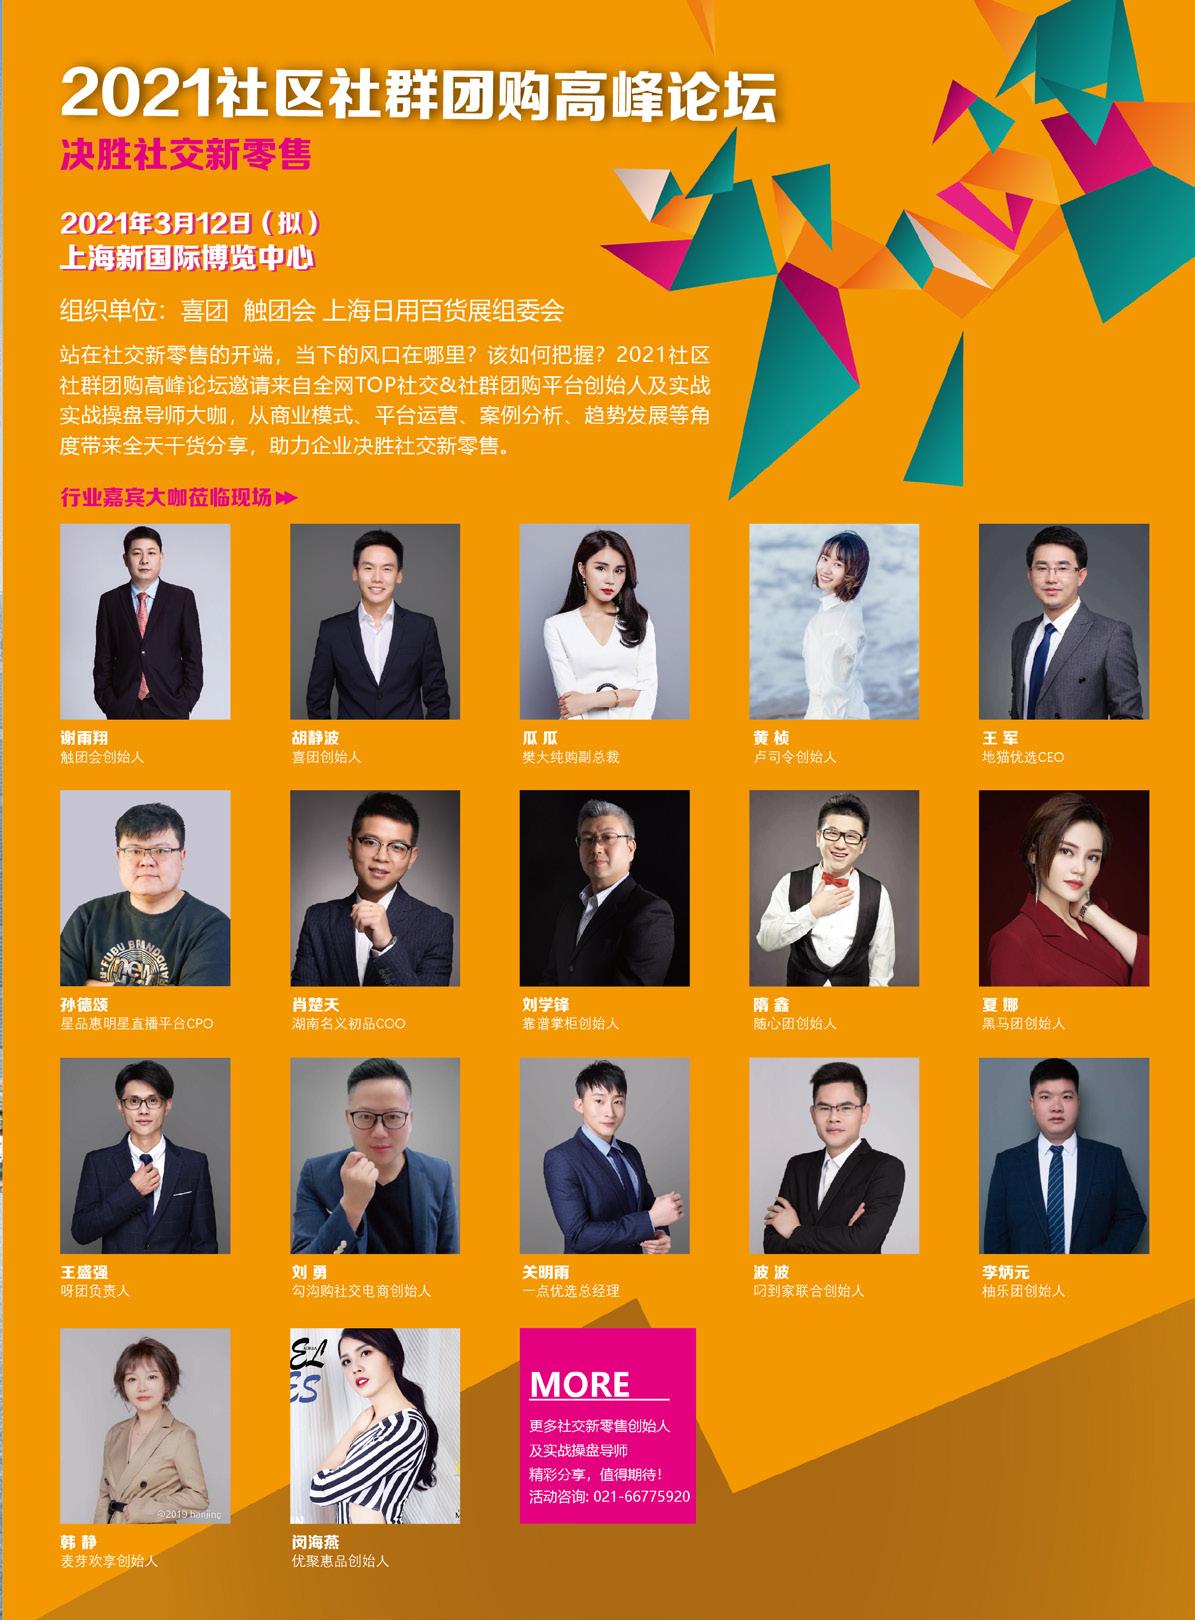 CCF春季百货展2021邀请_页面_15.jpg